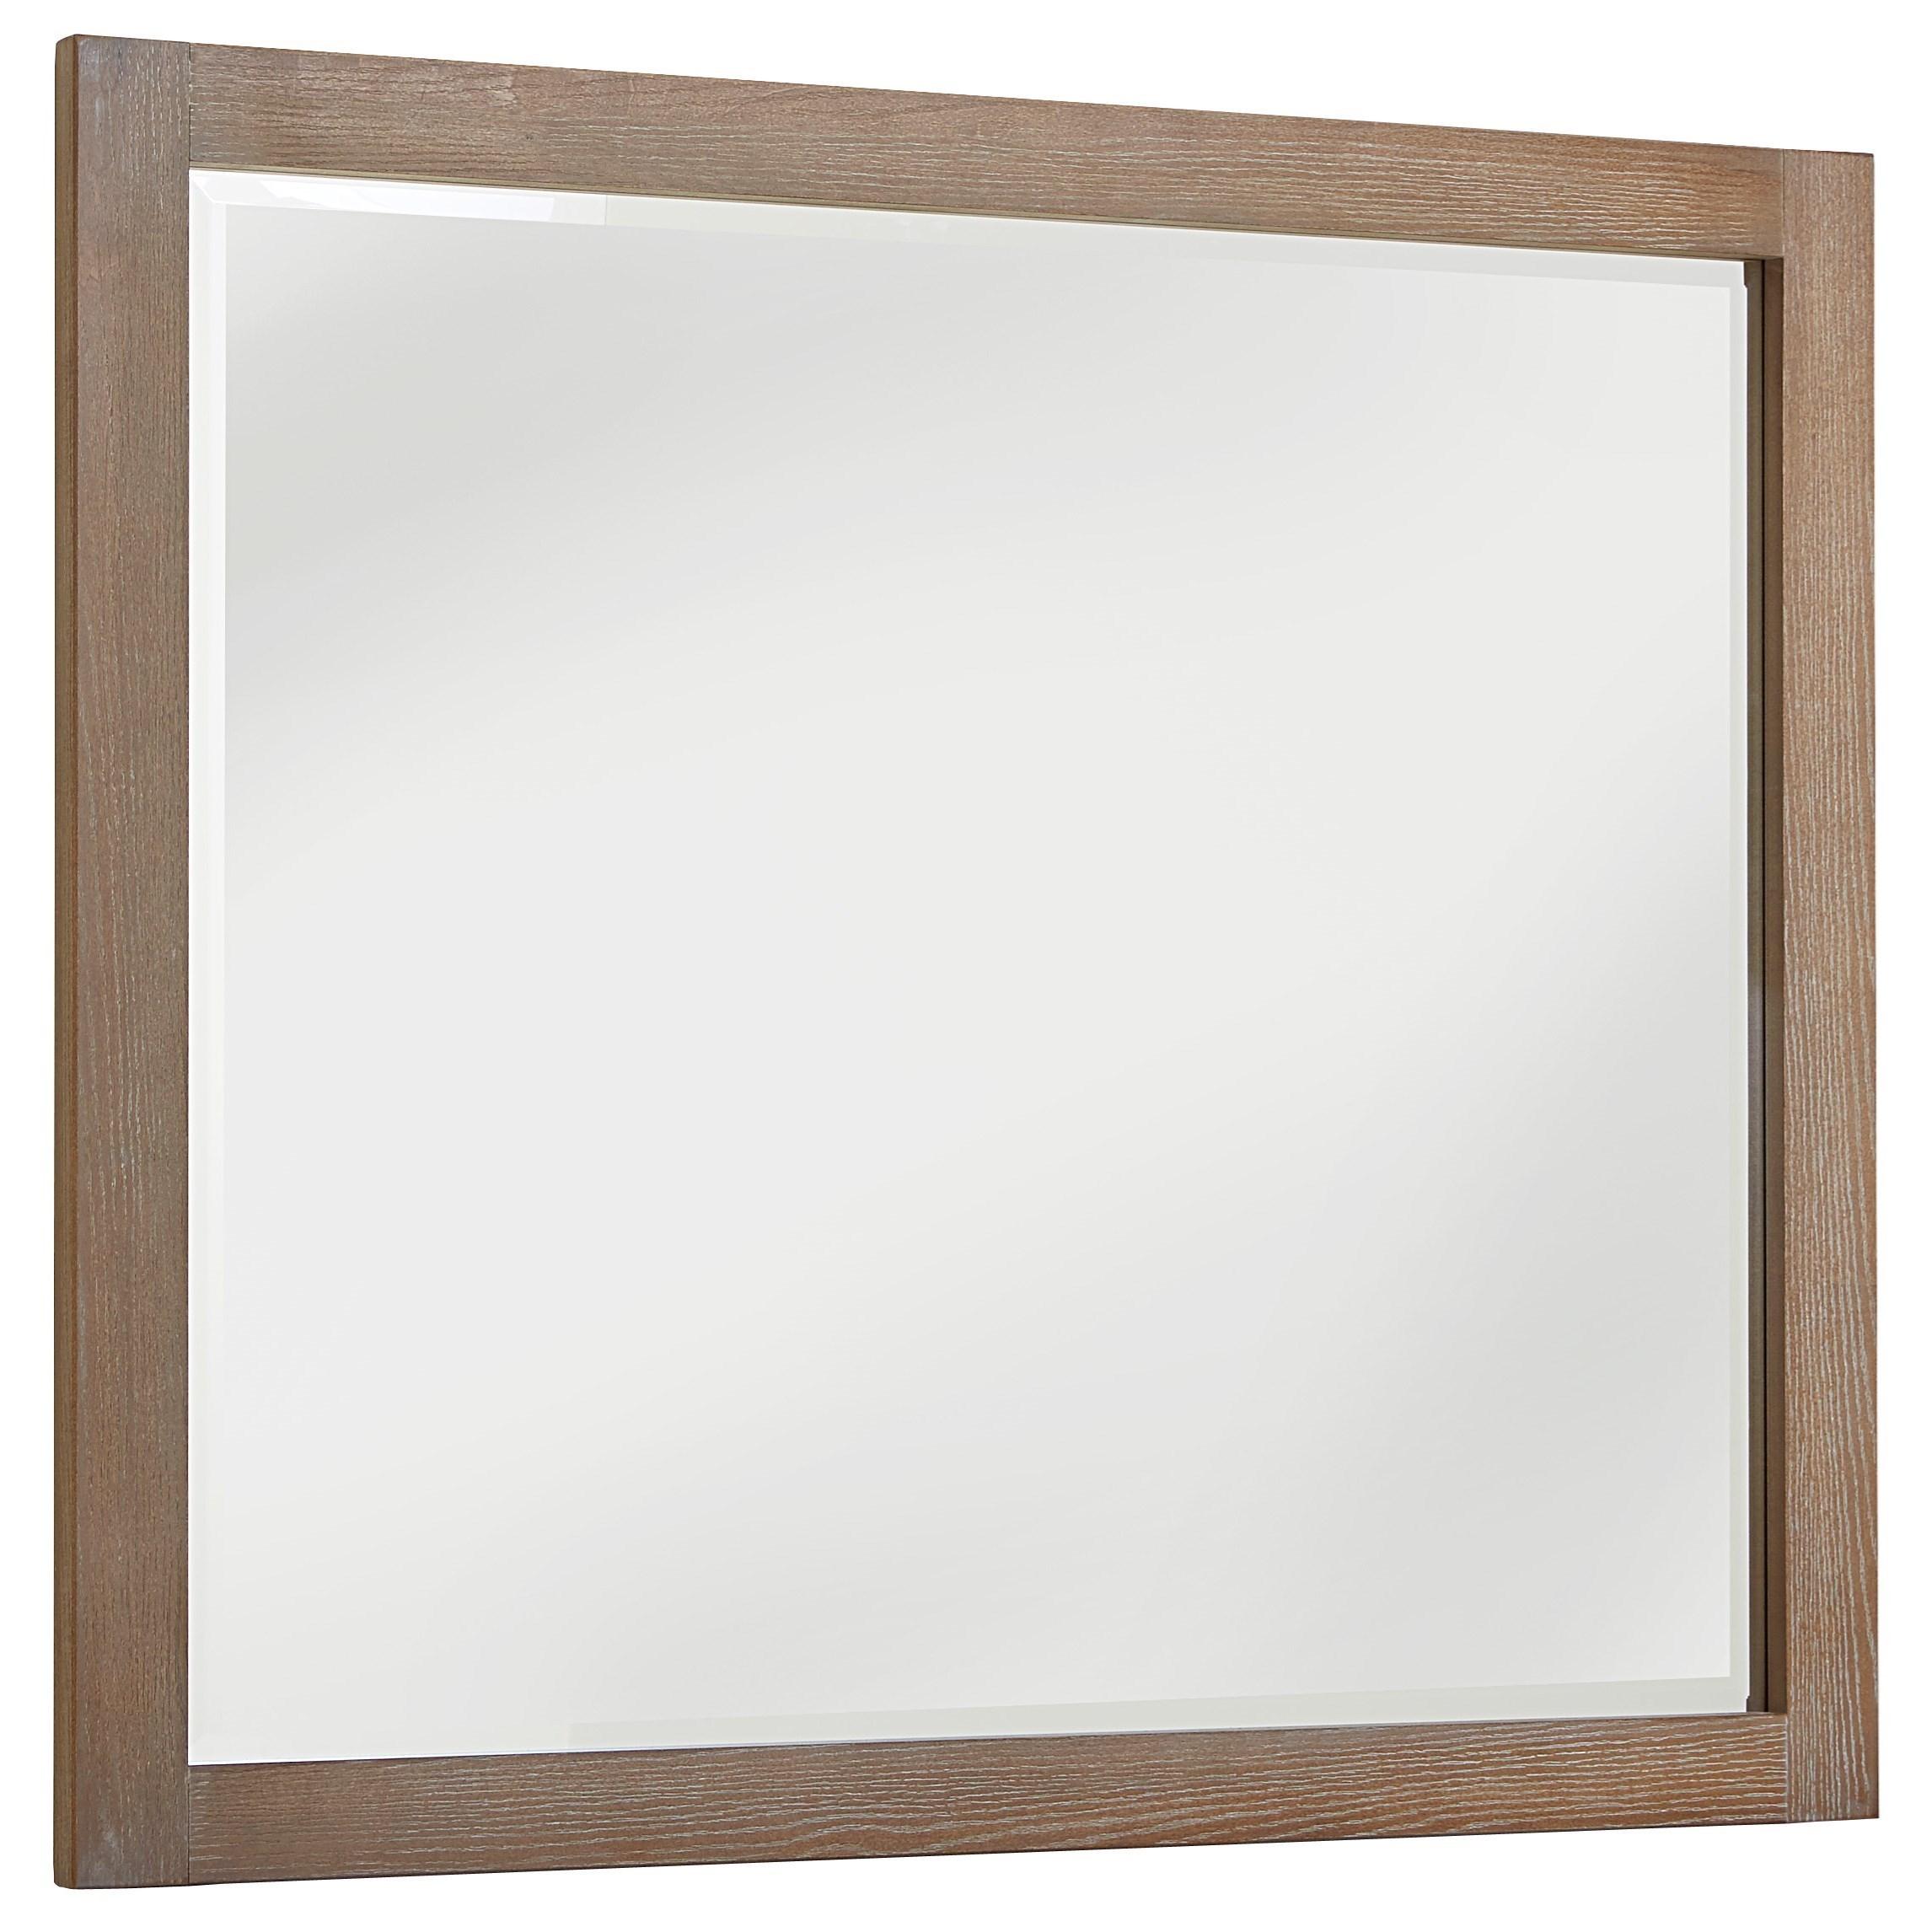 Vaughan Bassett American Modern Landscape Mirror - Beveled Glass - Item Number: 652-446